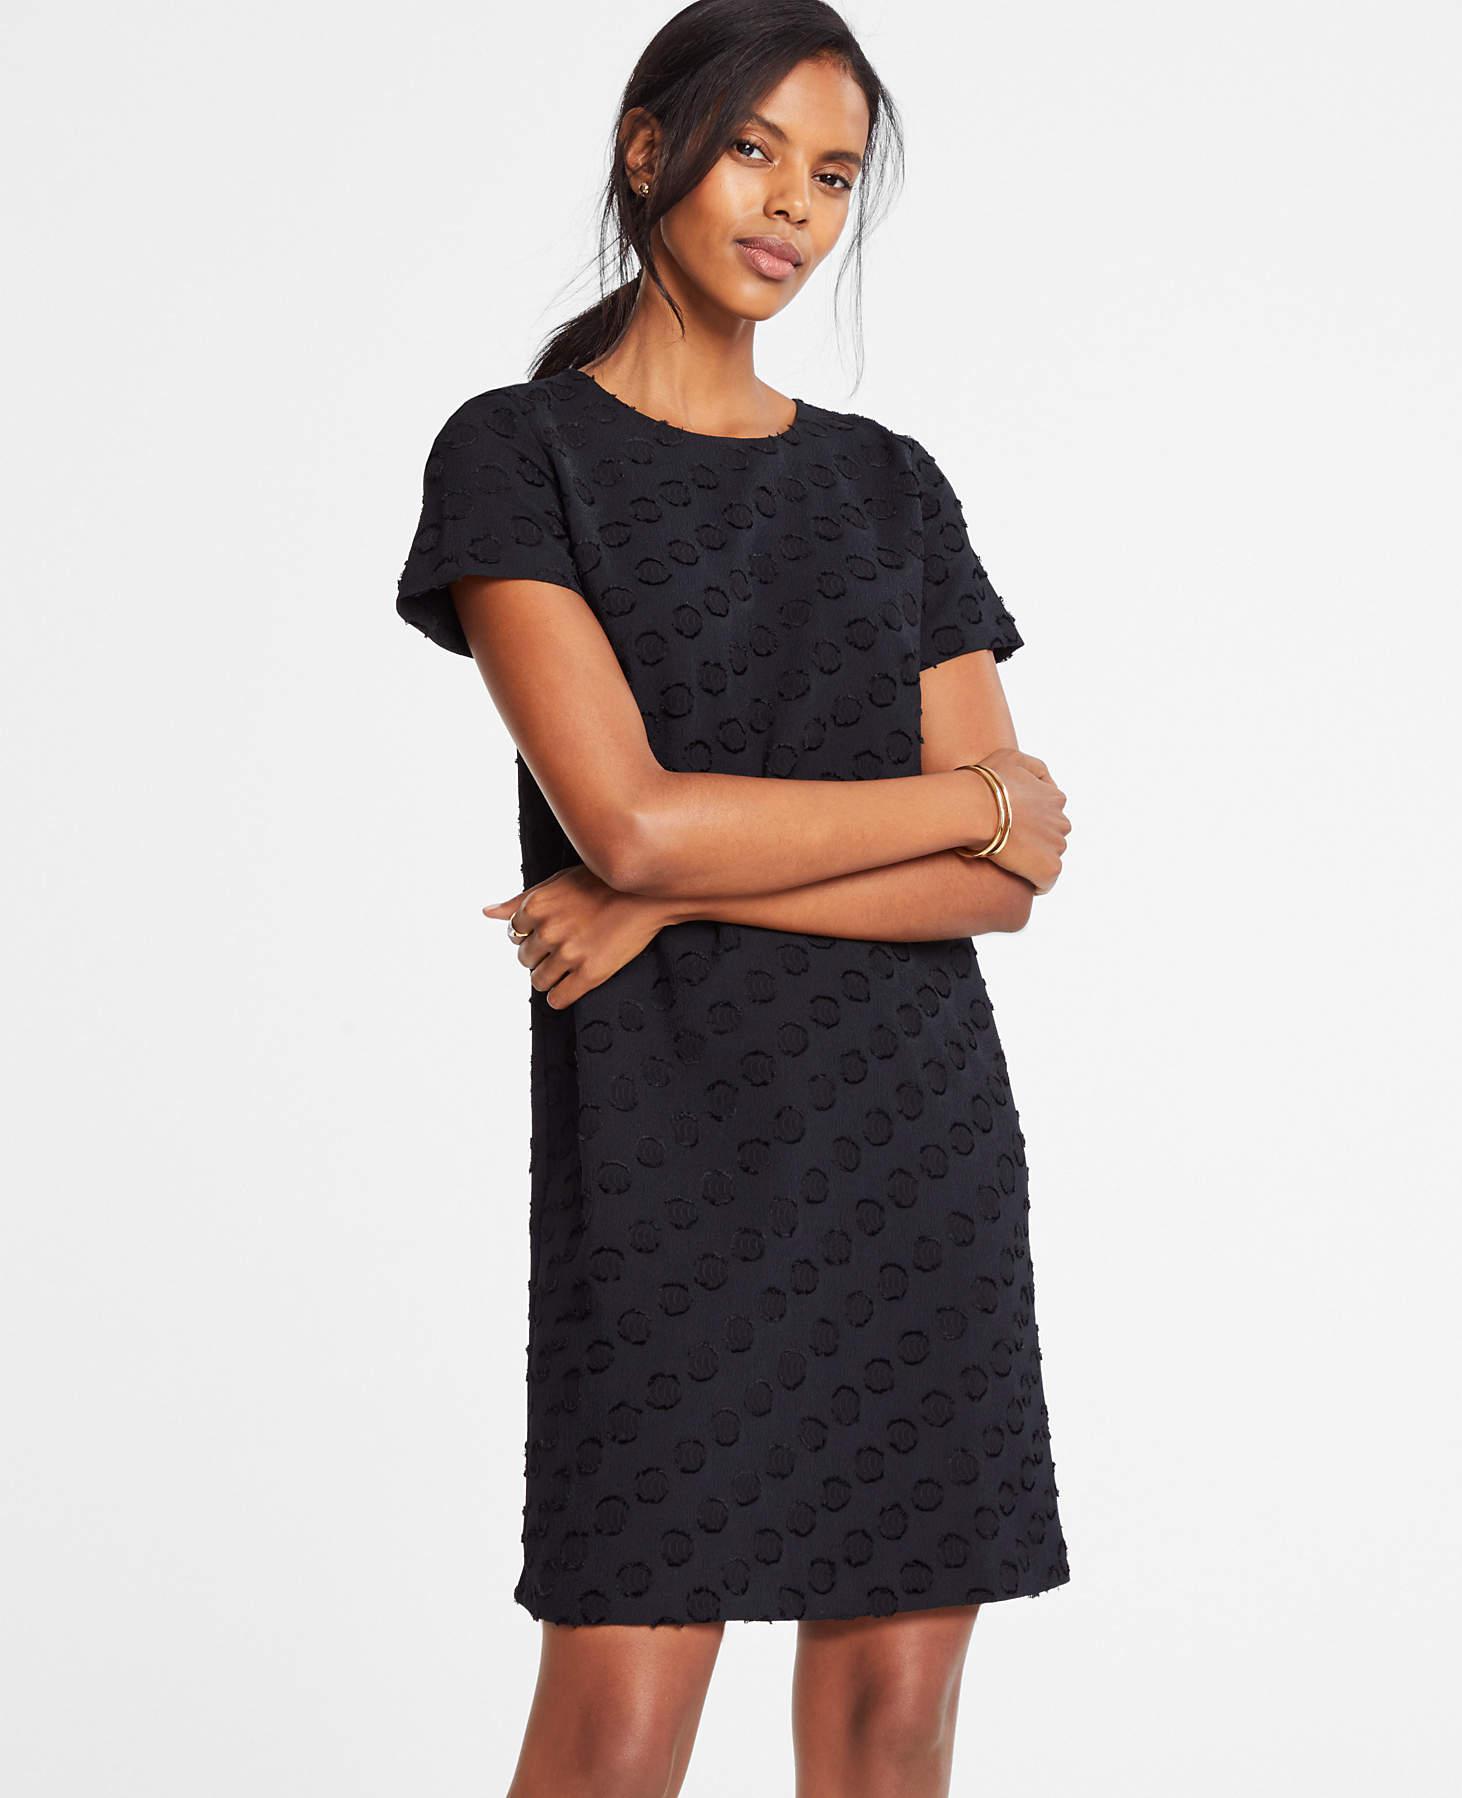 67e29d46c2ba Lyst - Ann Taylor Dot Jacquard T-shirt Dress in Black - Save 42%